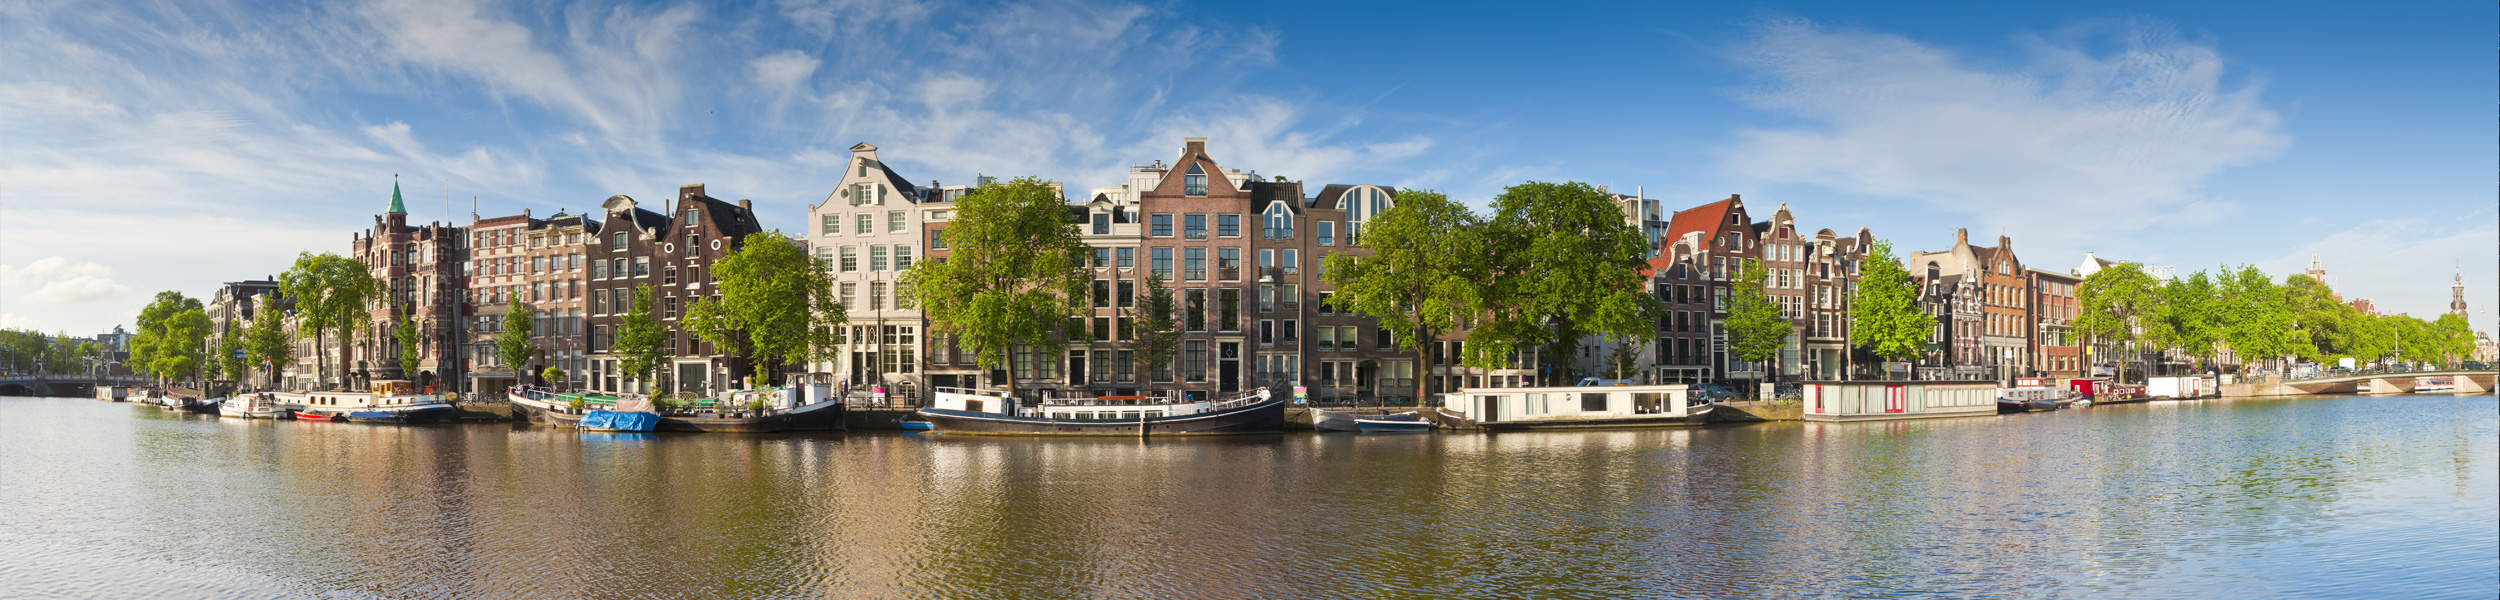 Senior Backend Software Engineer Amsterdam, The Netherlands